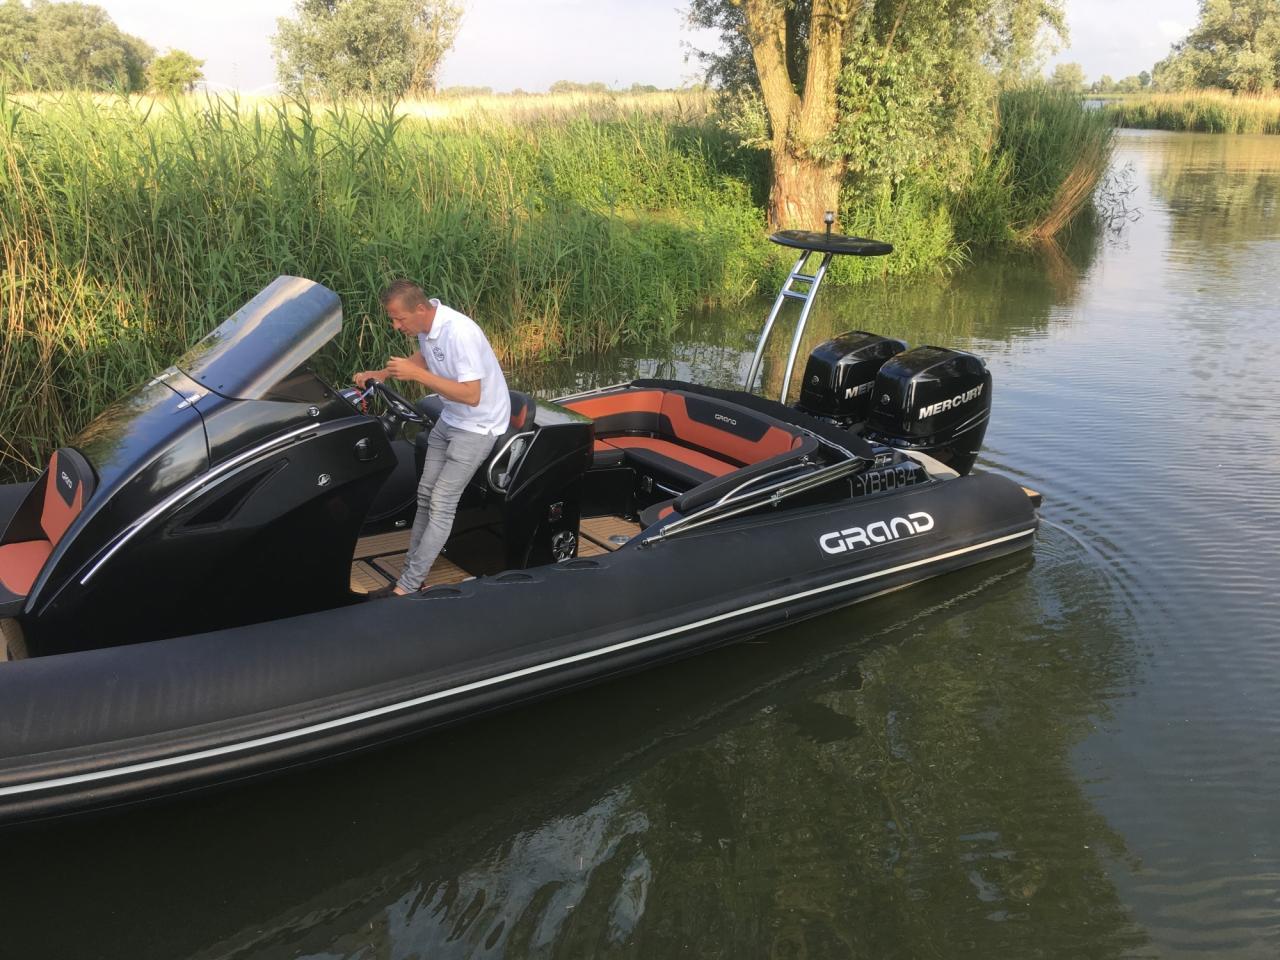 Grand 850 rib met 2x Mercury Verado 225 pk 2